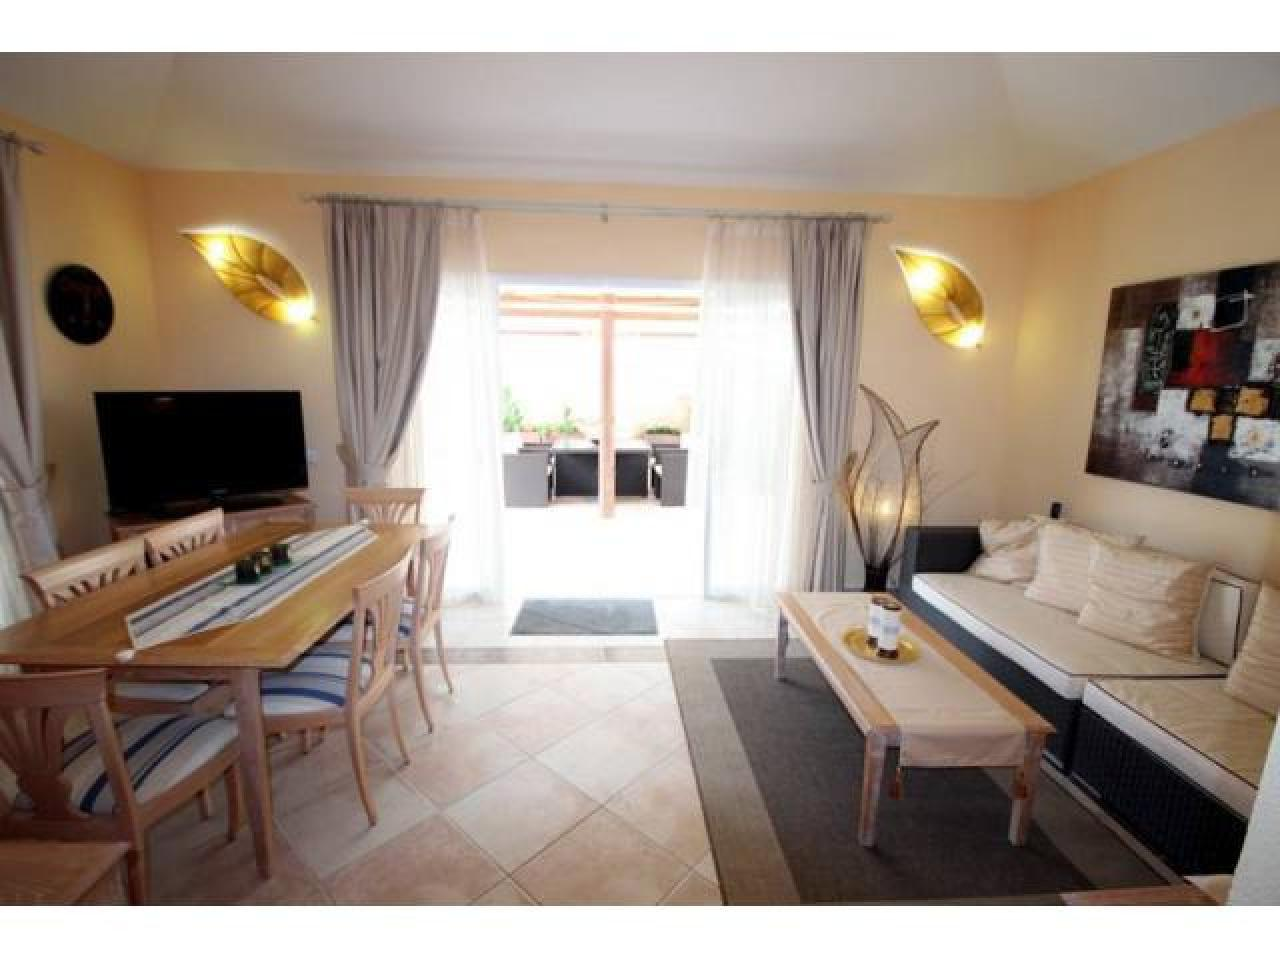 Villa in Tenerife for rent, in Costa Adeje, Madronal de Fanabe - 7